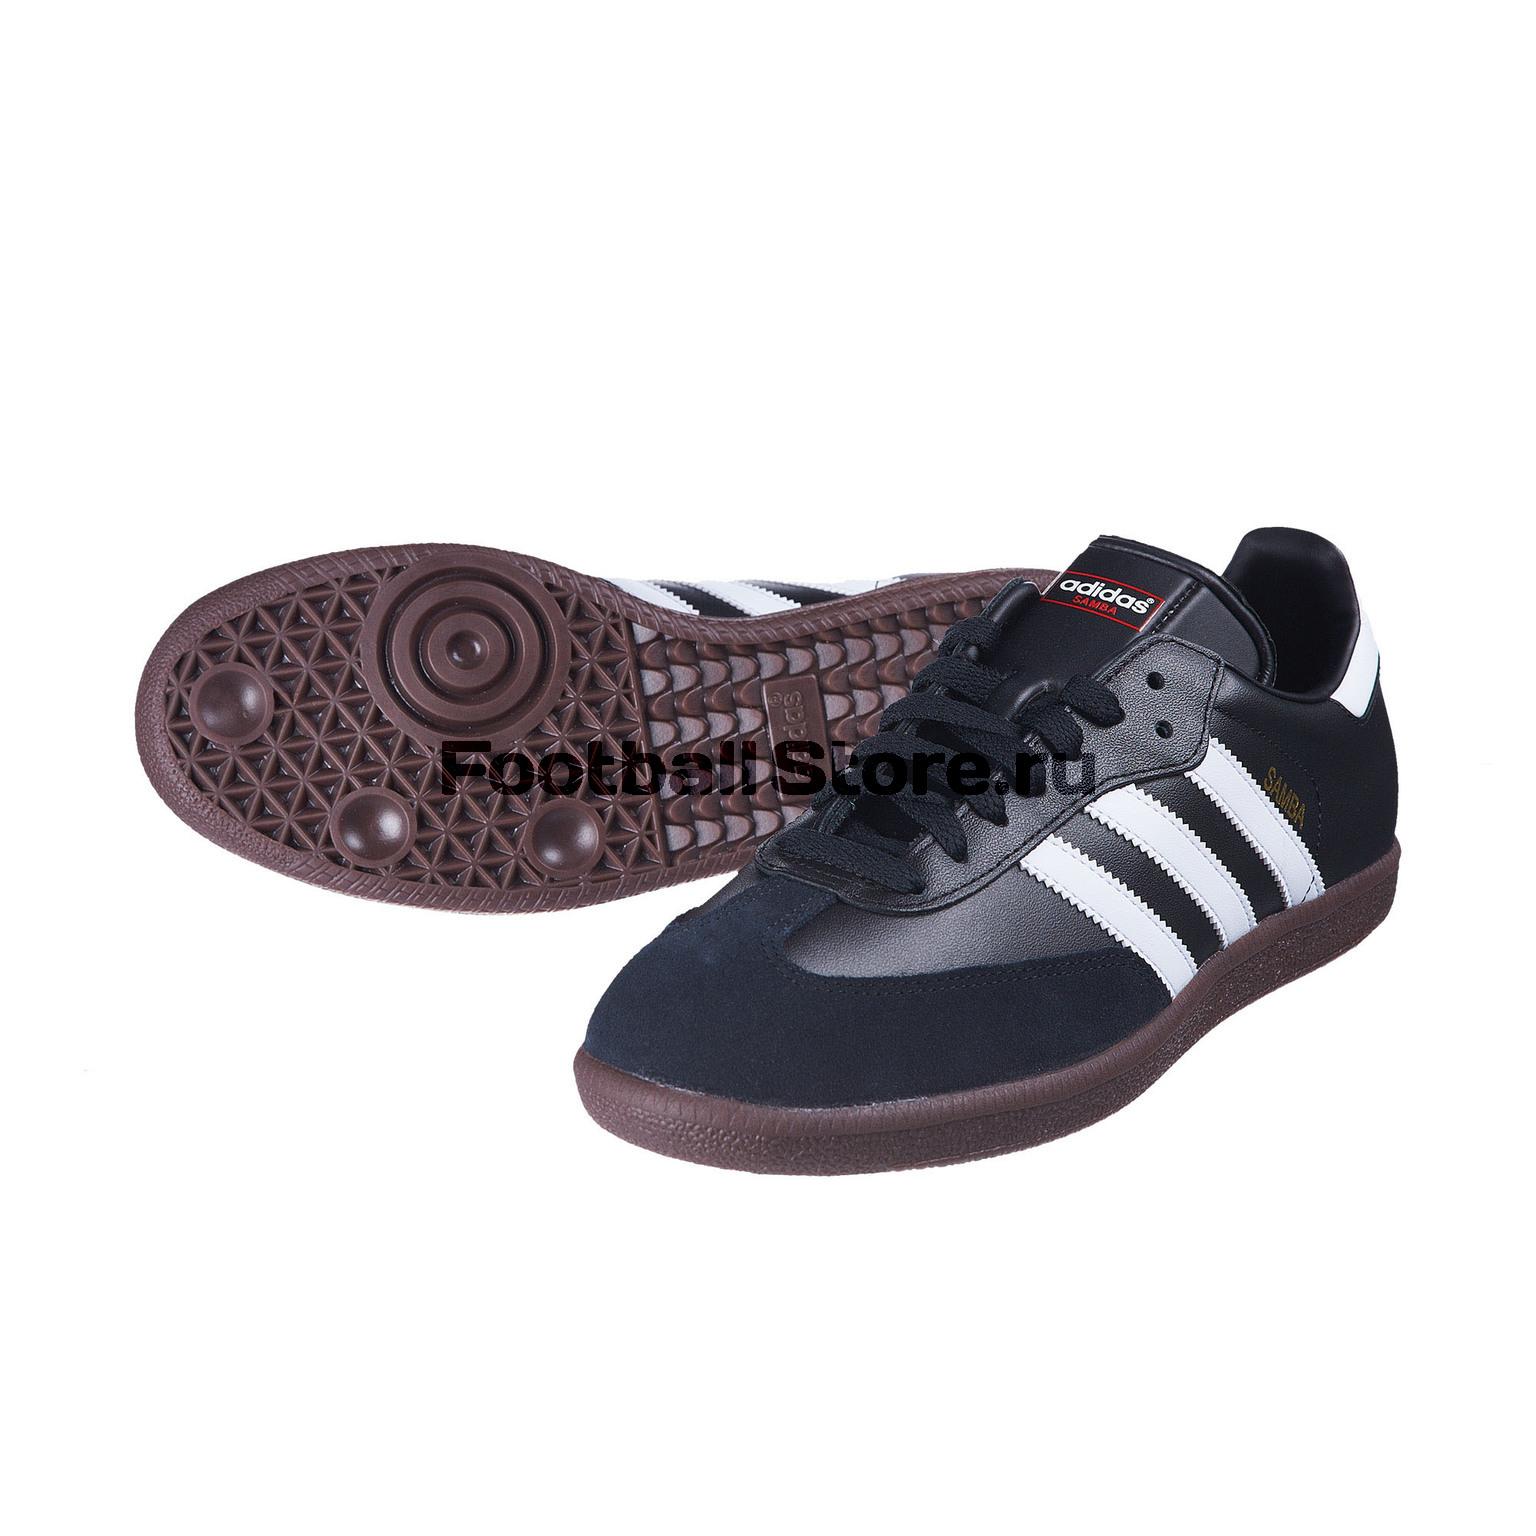 Футзалки Adidas Samba 19000 цена